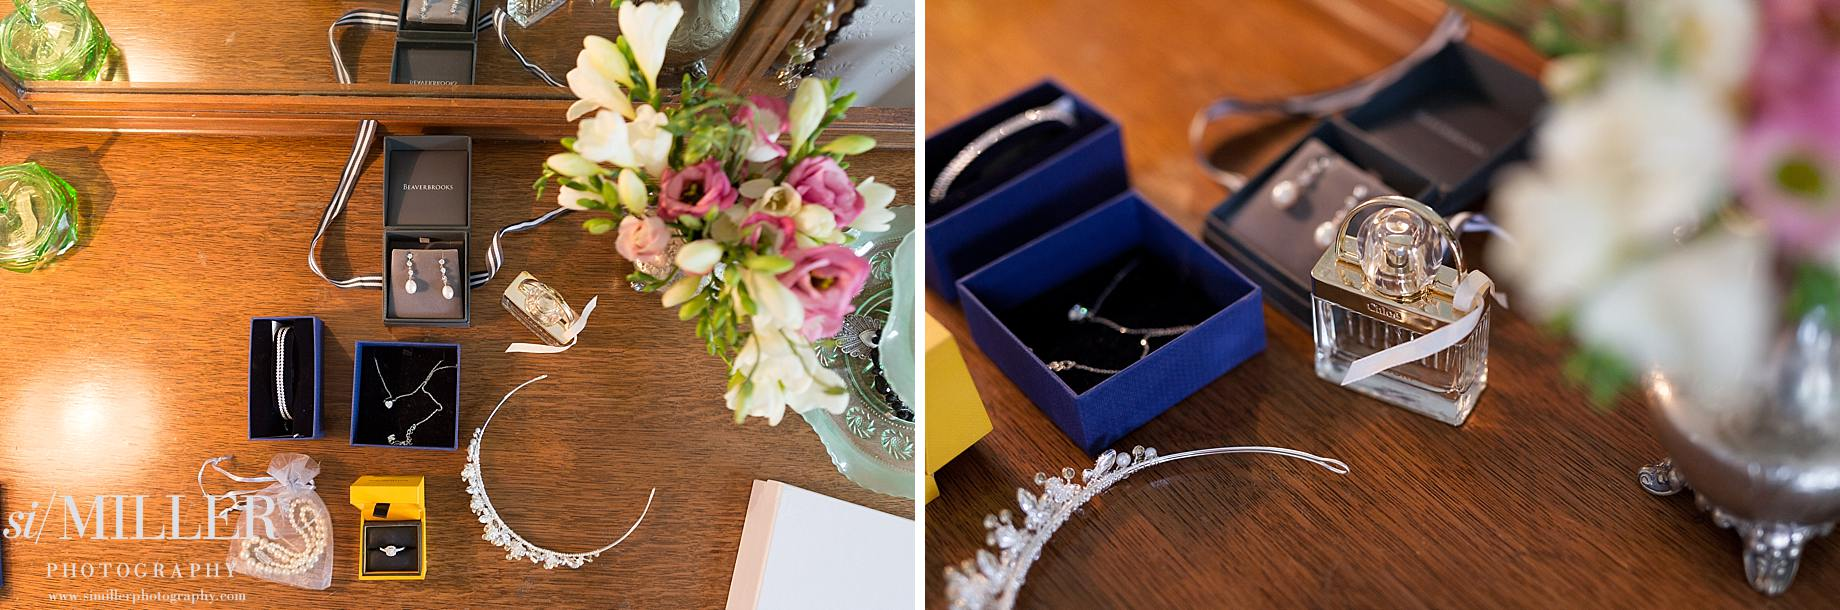 Lytham-white-church-wedding-photographer-lancashire-preston